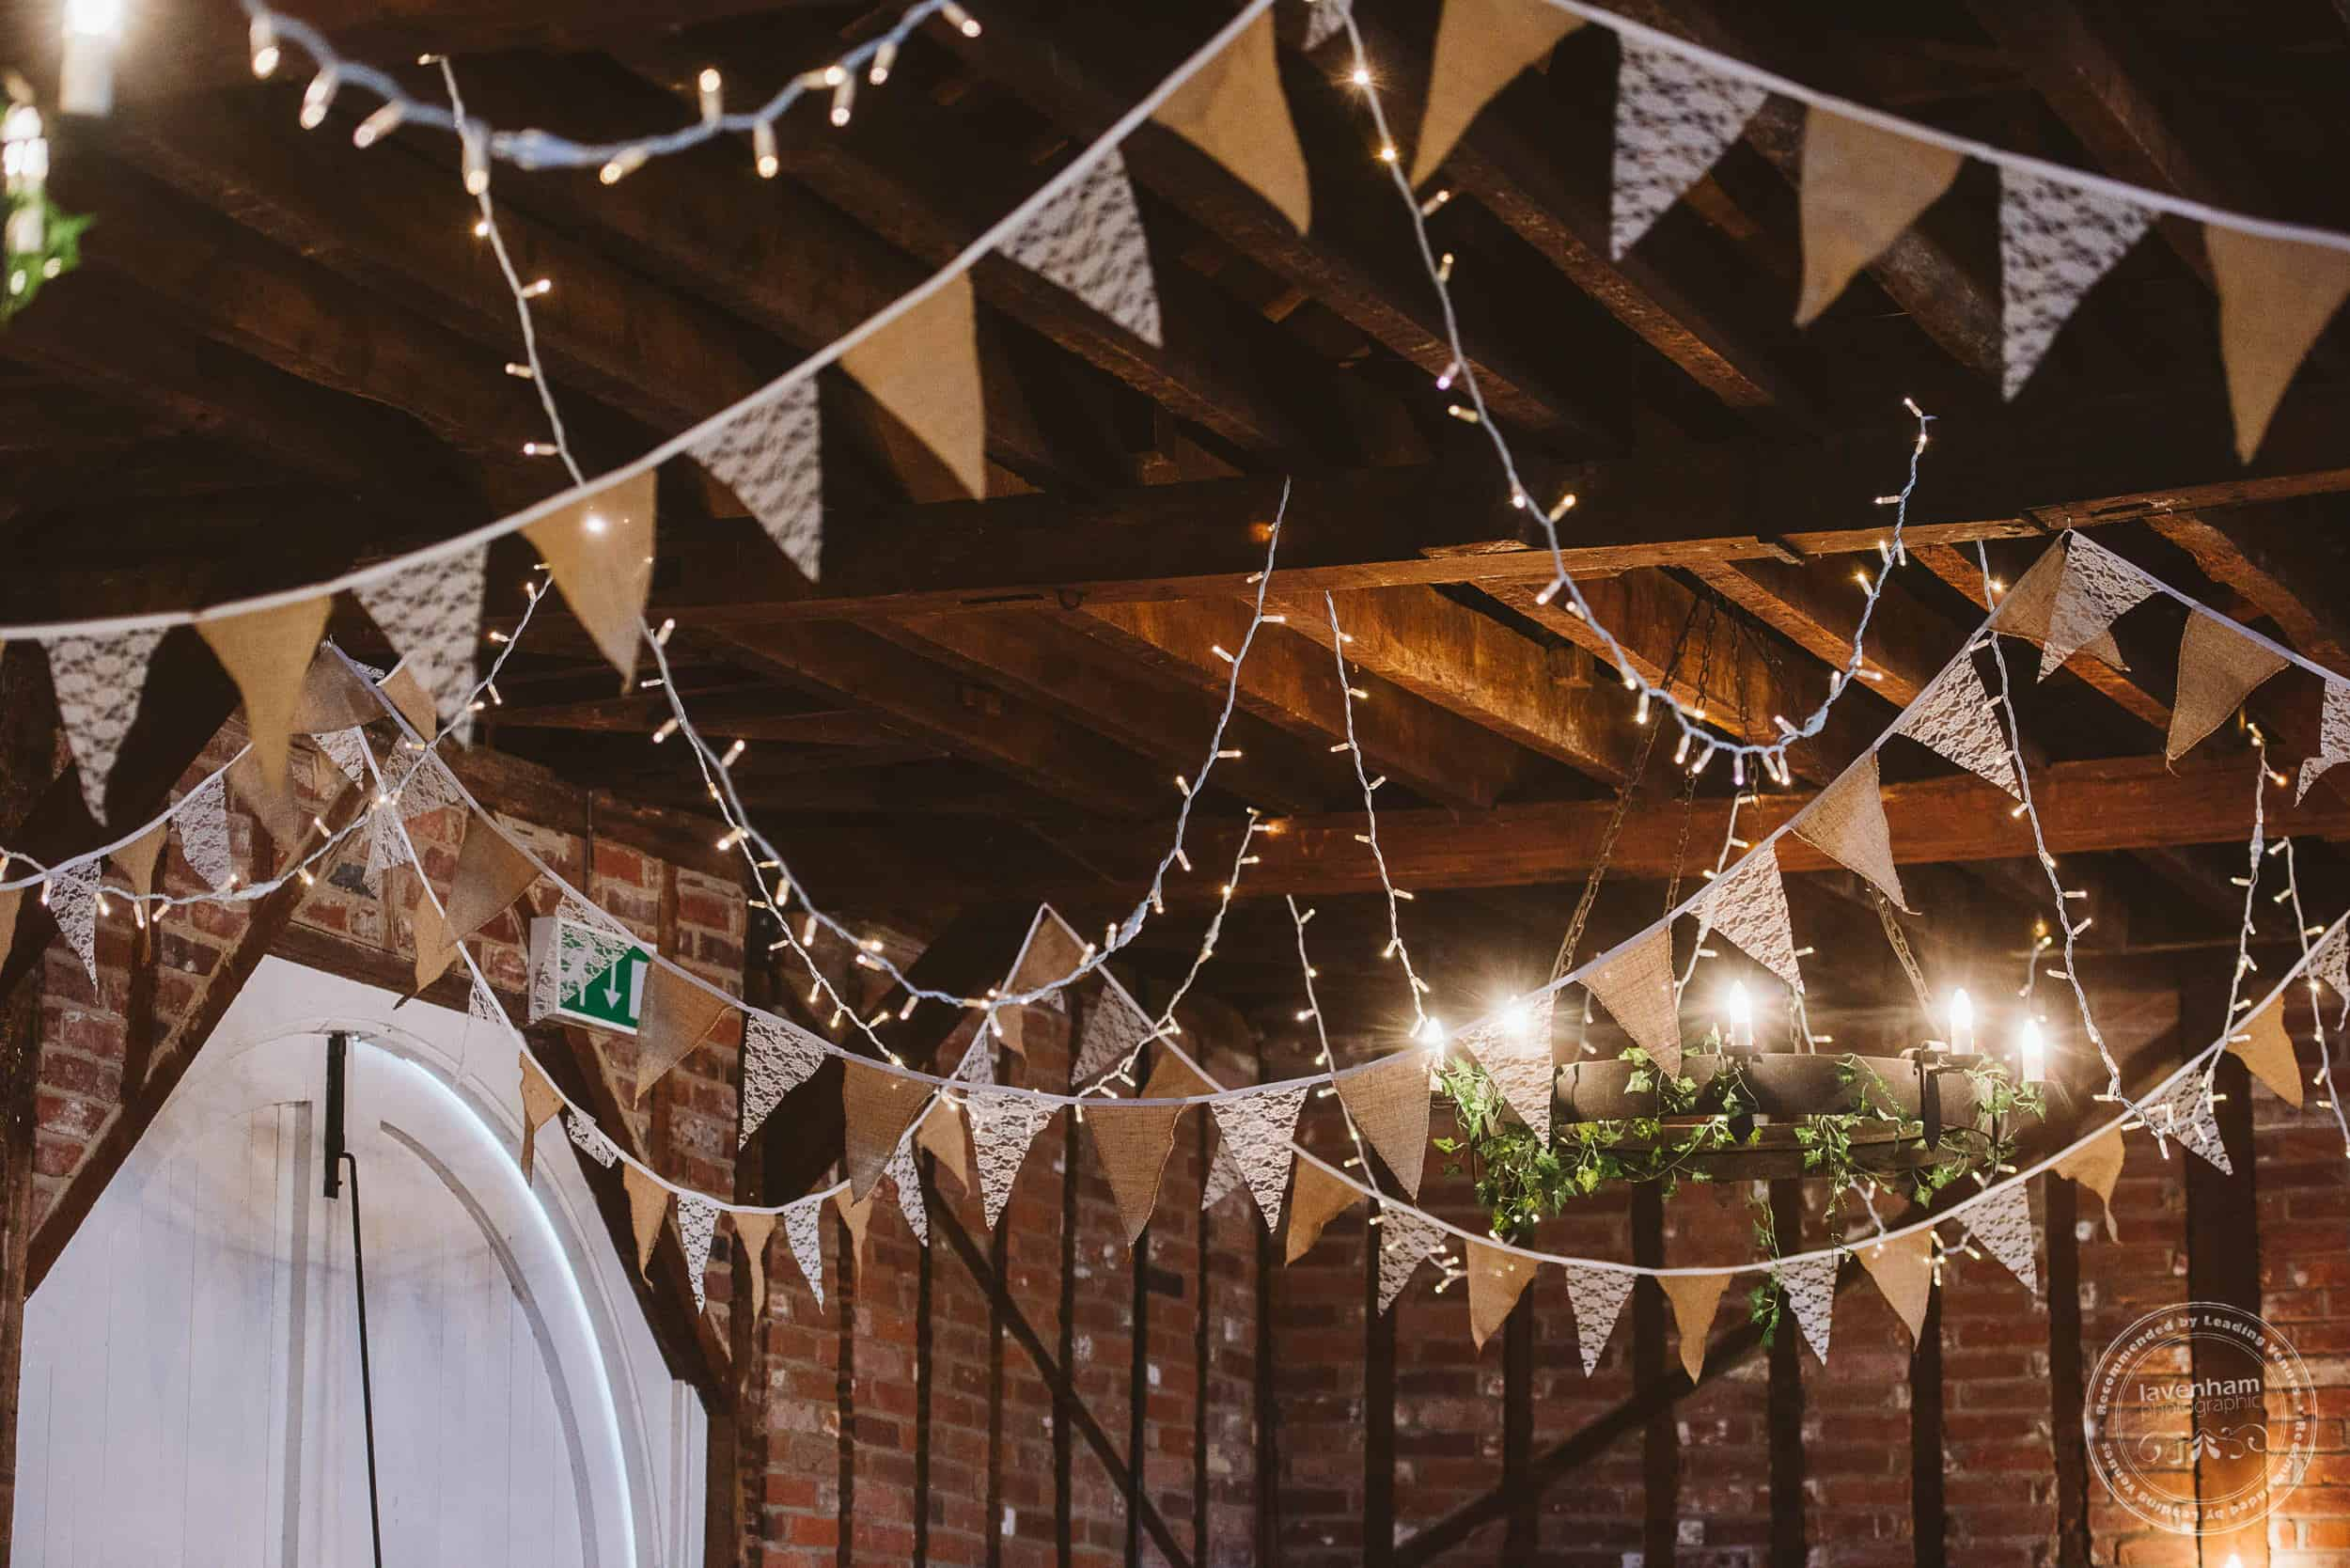 180818 Marks Hall Wedding Photography Lavenham Photographic 118